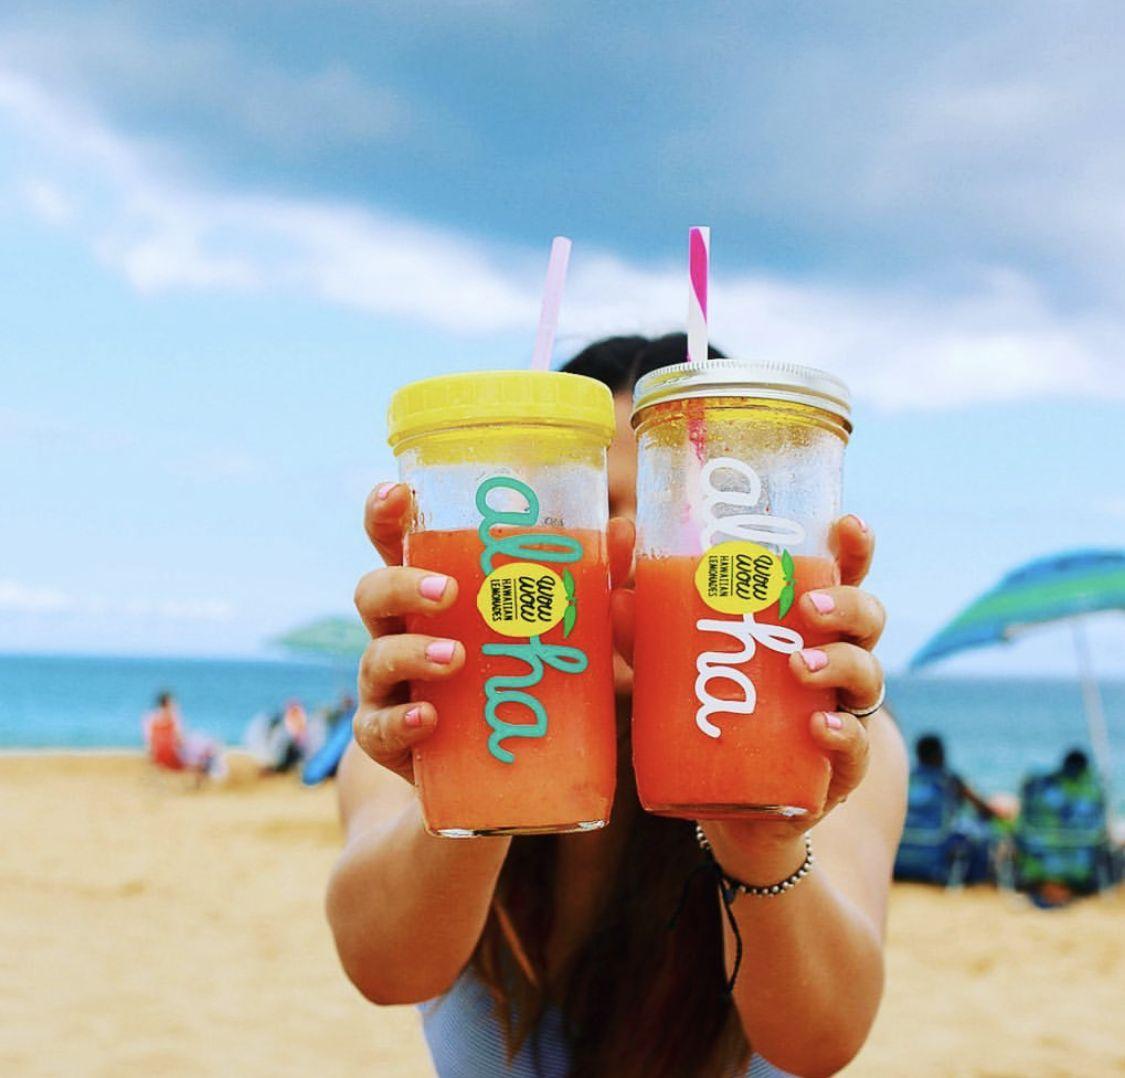 Wow Wow Hawaiian Lemonade Signs Franchise Deal, Brings Gourmet Lemonade Stand to Folsom